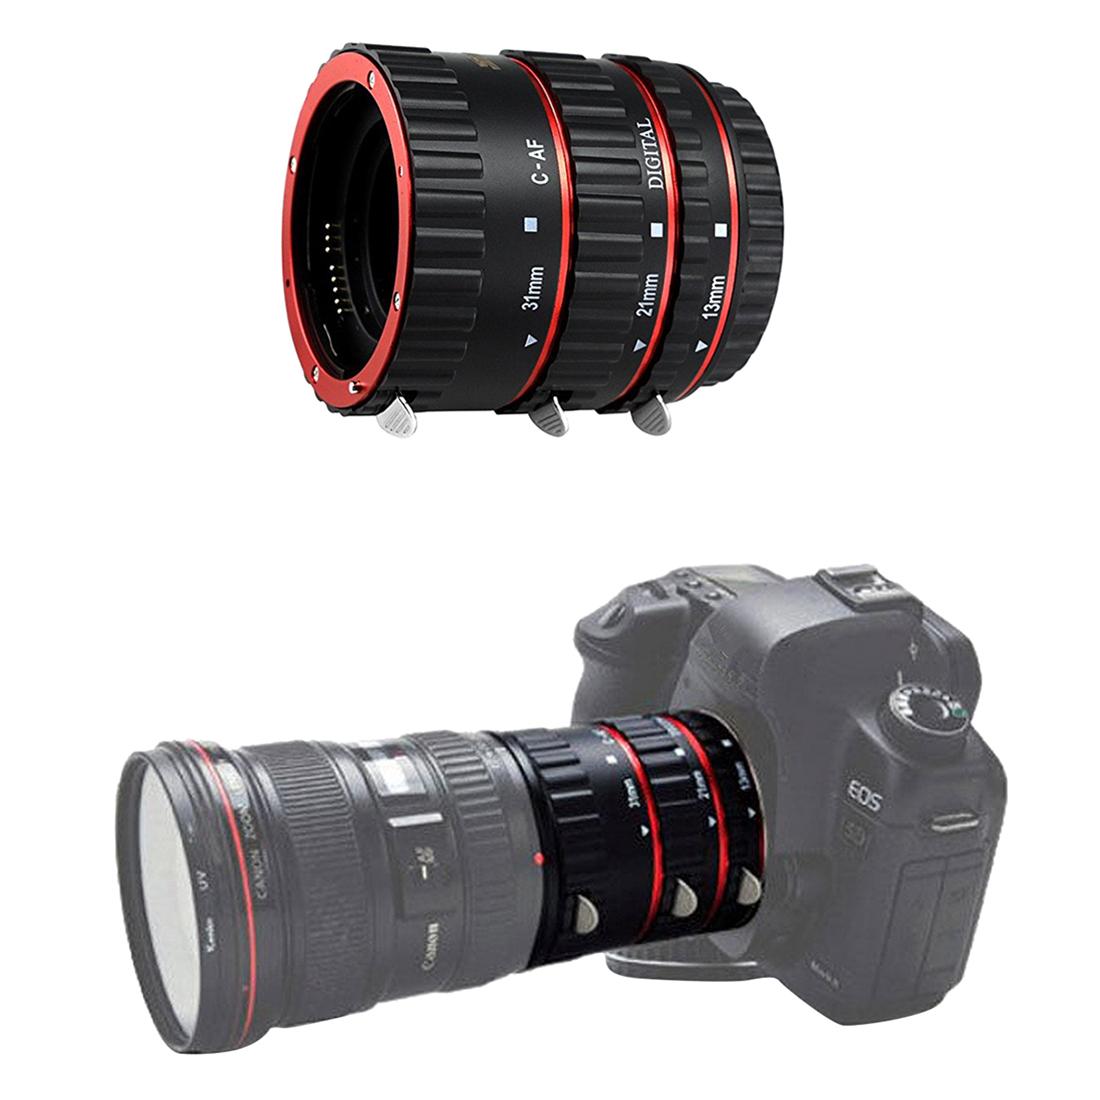 shoot auto focus macro extension tube set for slr cameras ef ef s lens e7w3 ebay. Black Bedroom Furniture Sets. Home Design Ideas